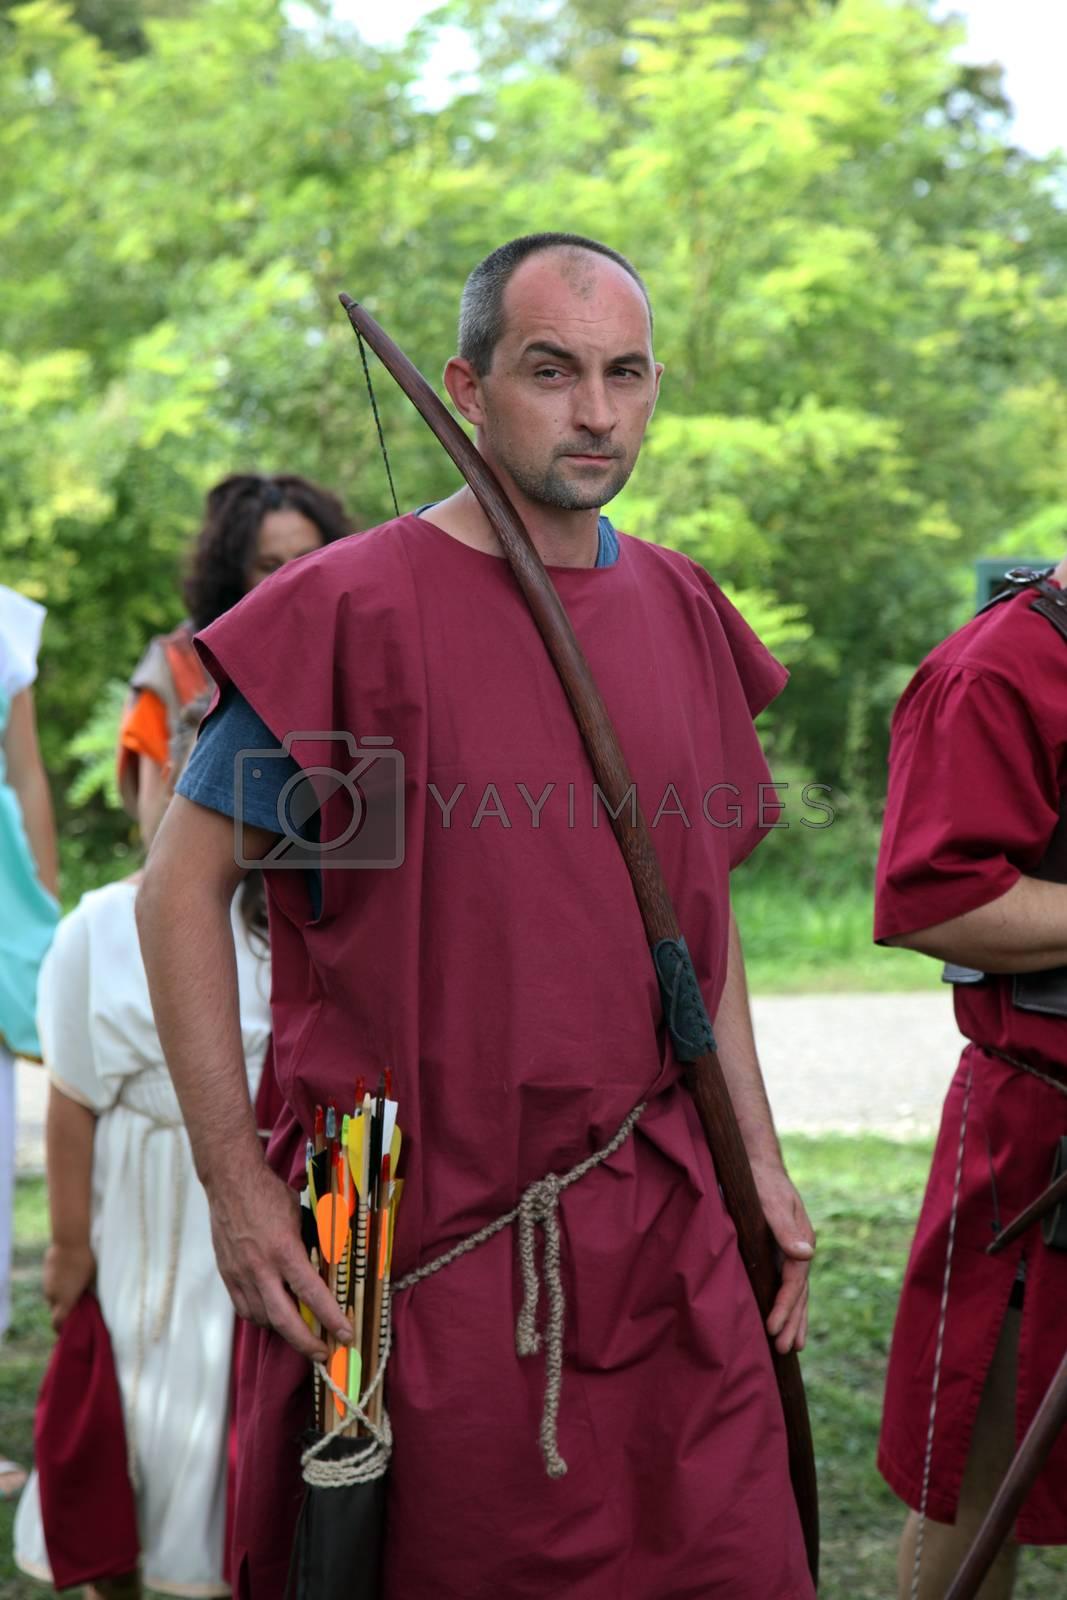 In Andautonija, ancient Roman settlement near Zagreb held Dionysus festivities on Sep 15, 2013 in Zagreb, Croatia.